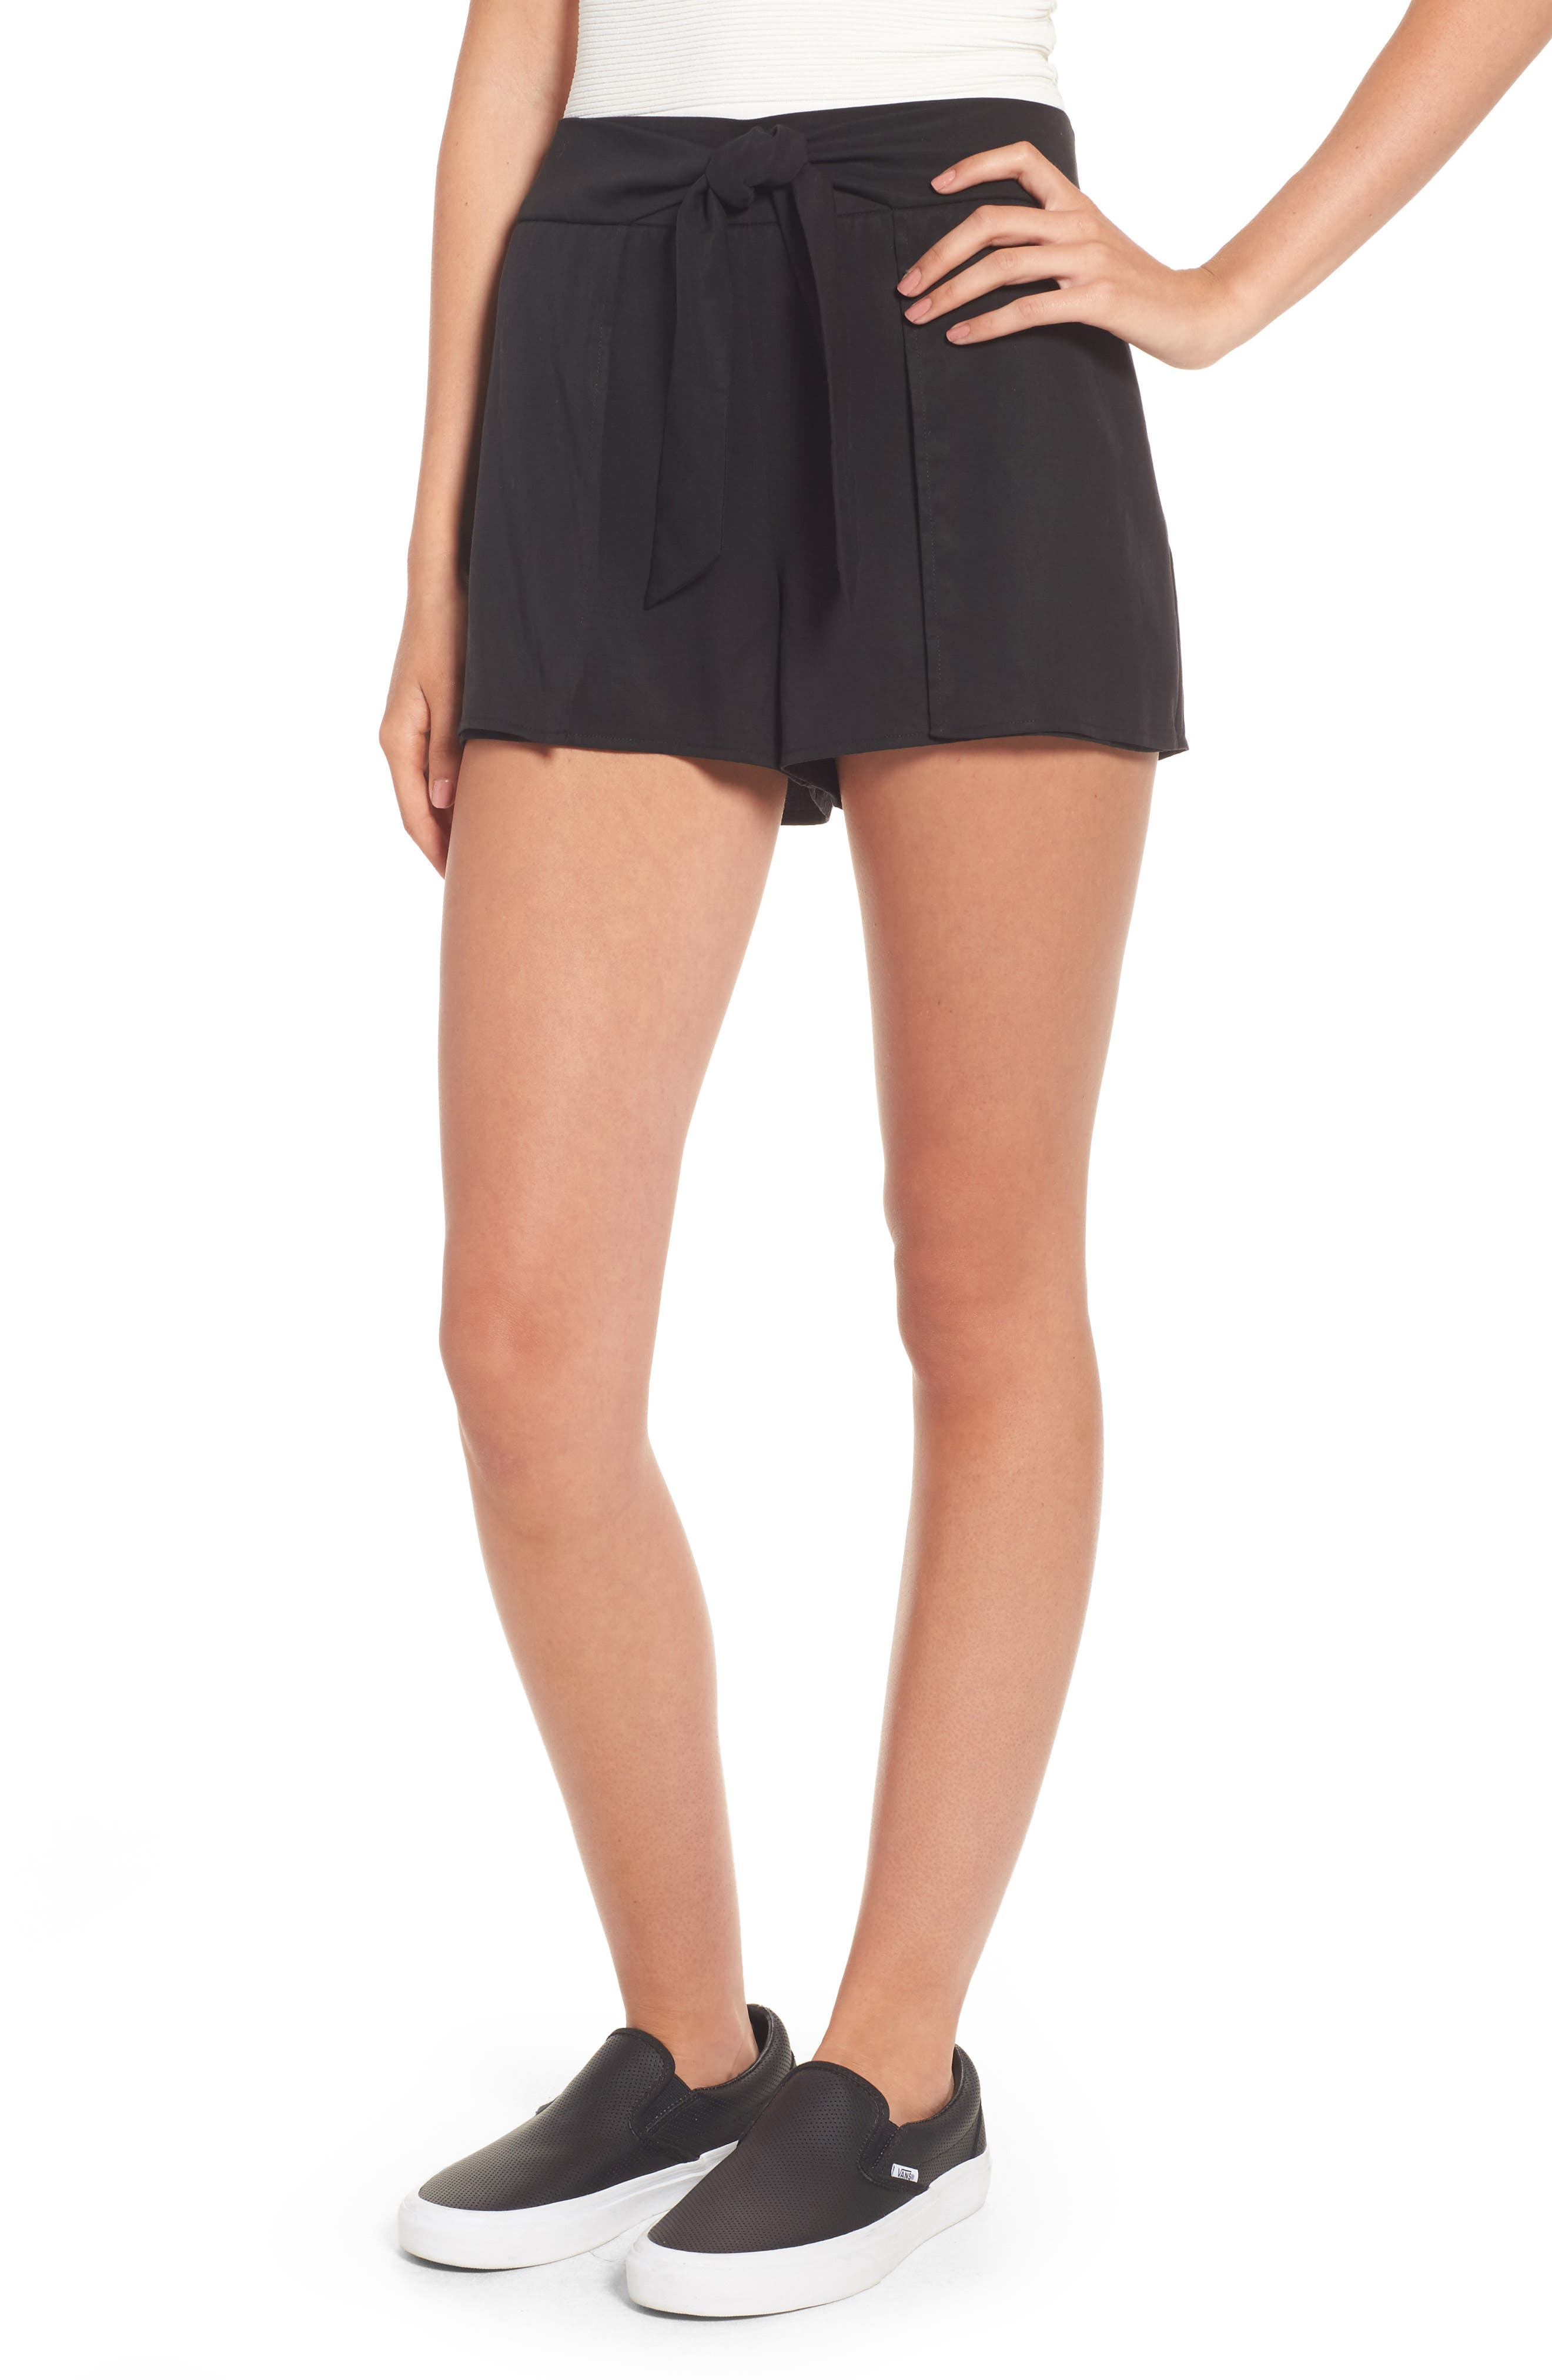 Socialite Tie Waist Shorts